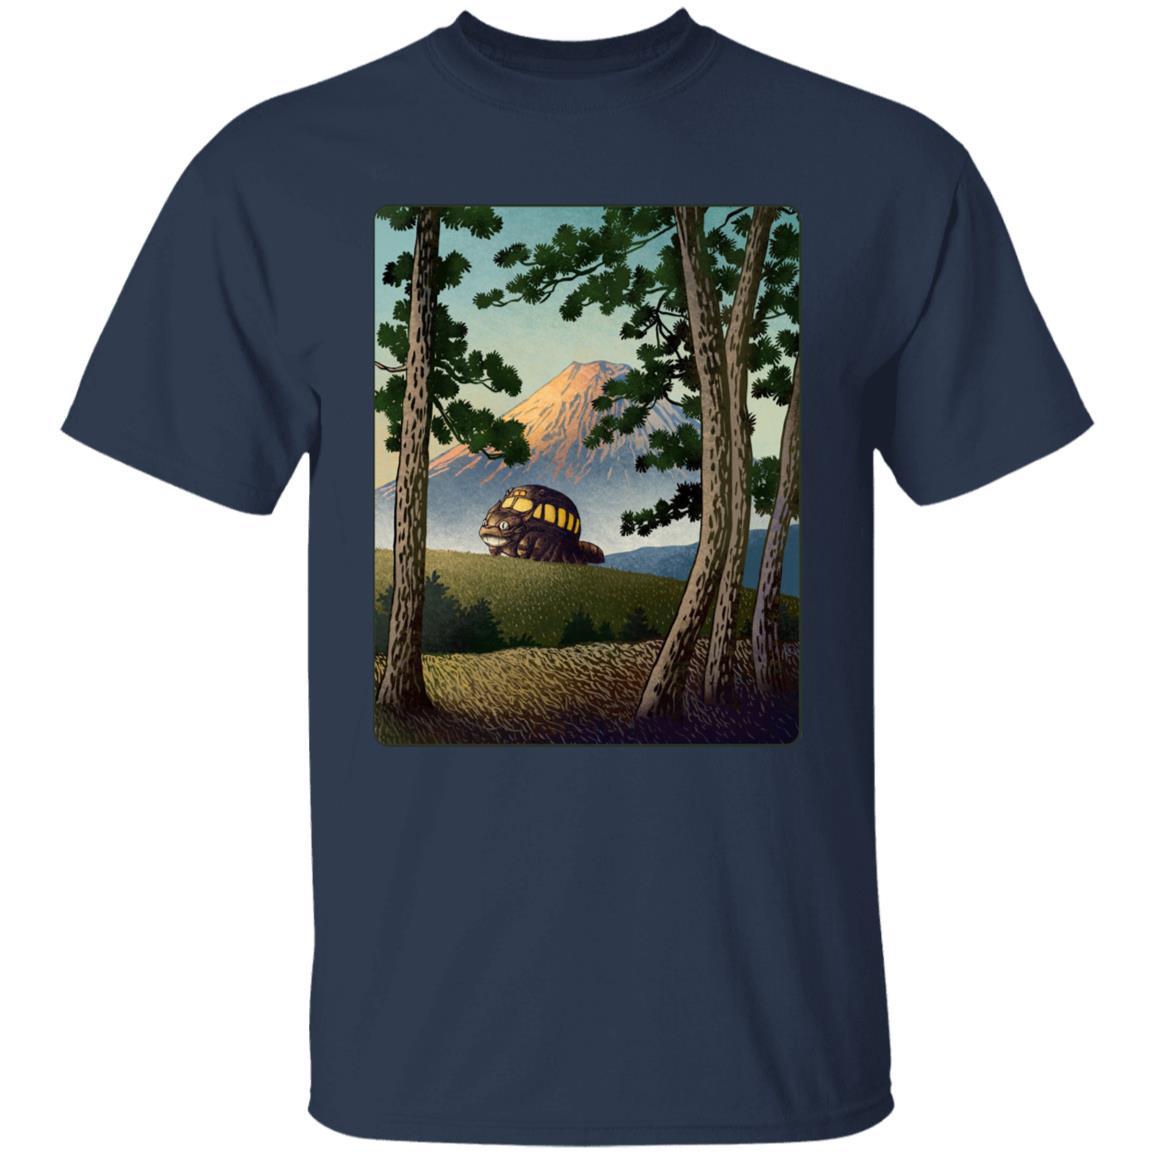 My Neighbor Totoro – Catbus Landscape T Shirt